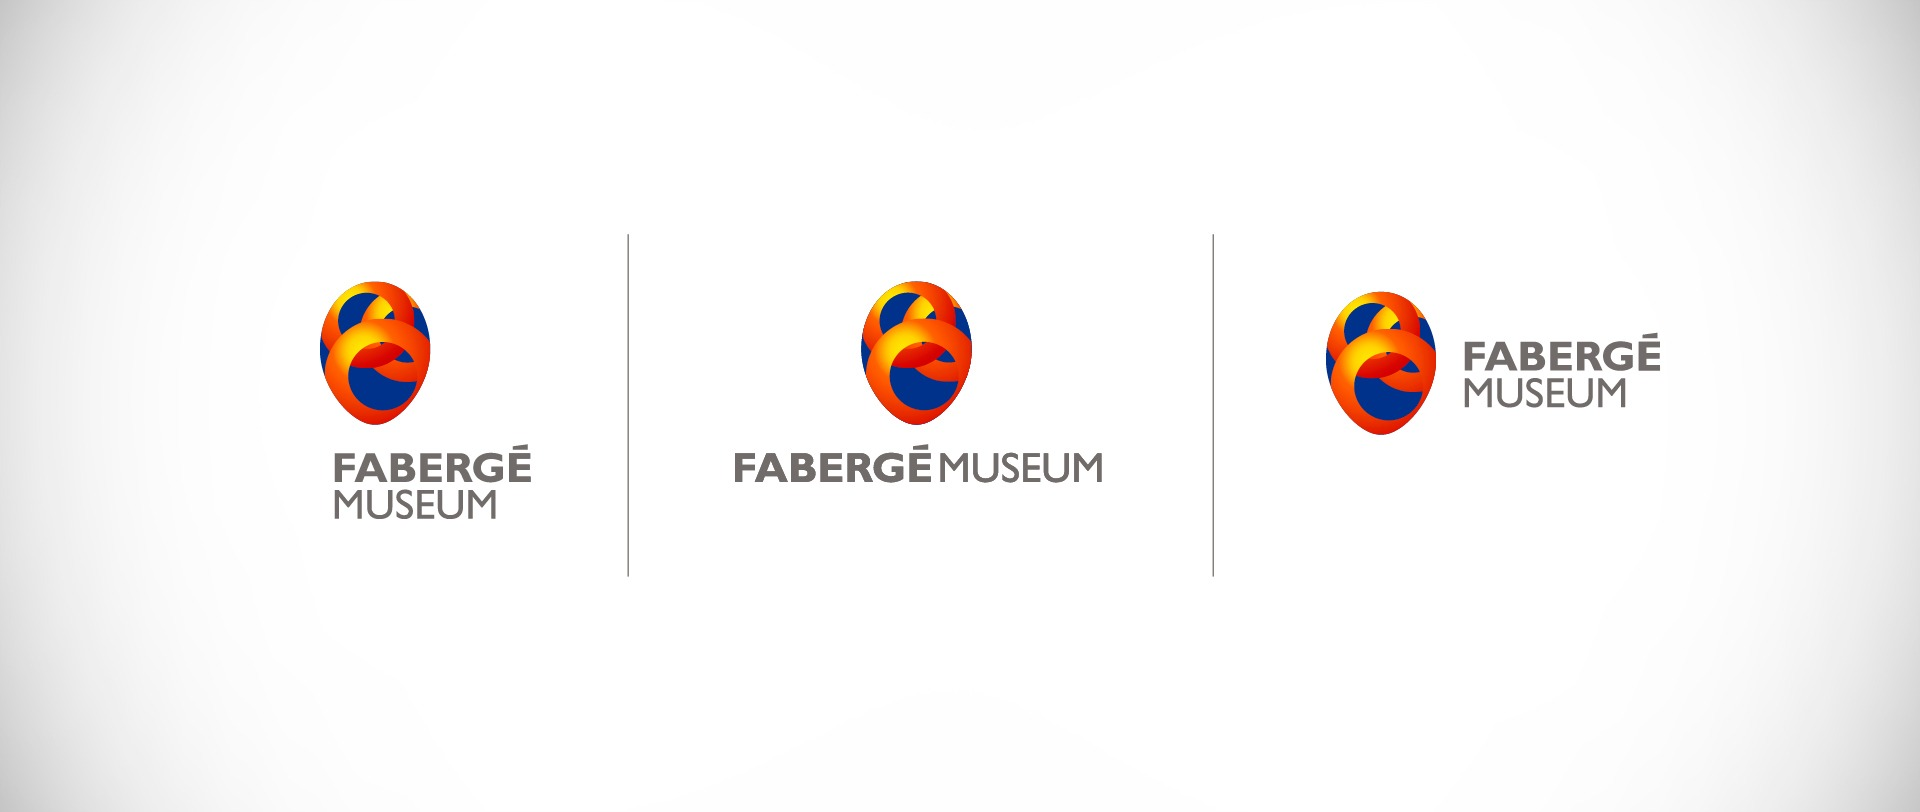 Музей Фаберже, Асгард Брендинг, Faberge Museum, дизайн логотипа, Asgard, яйцо Фаберже